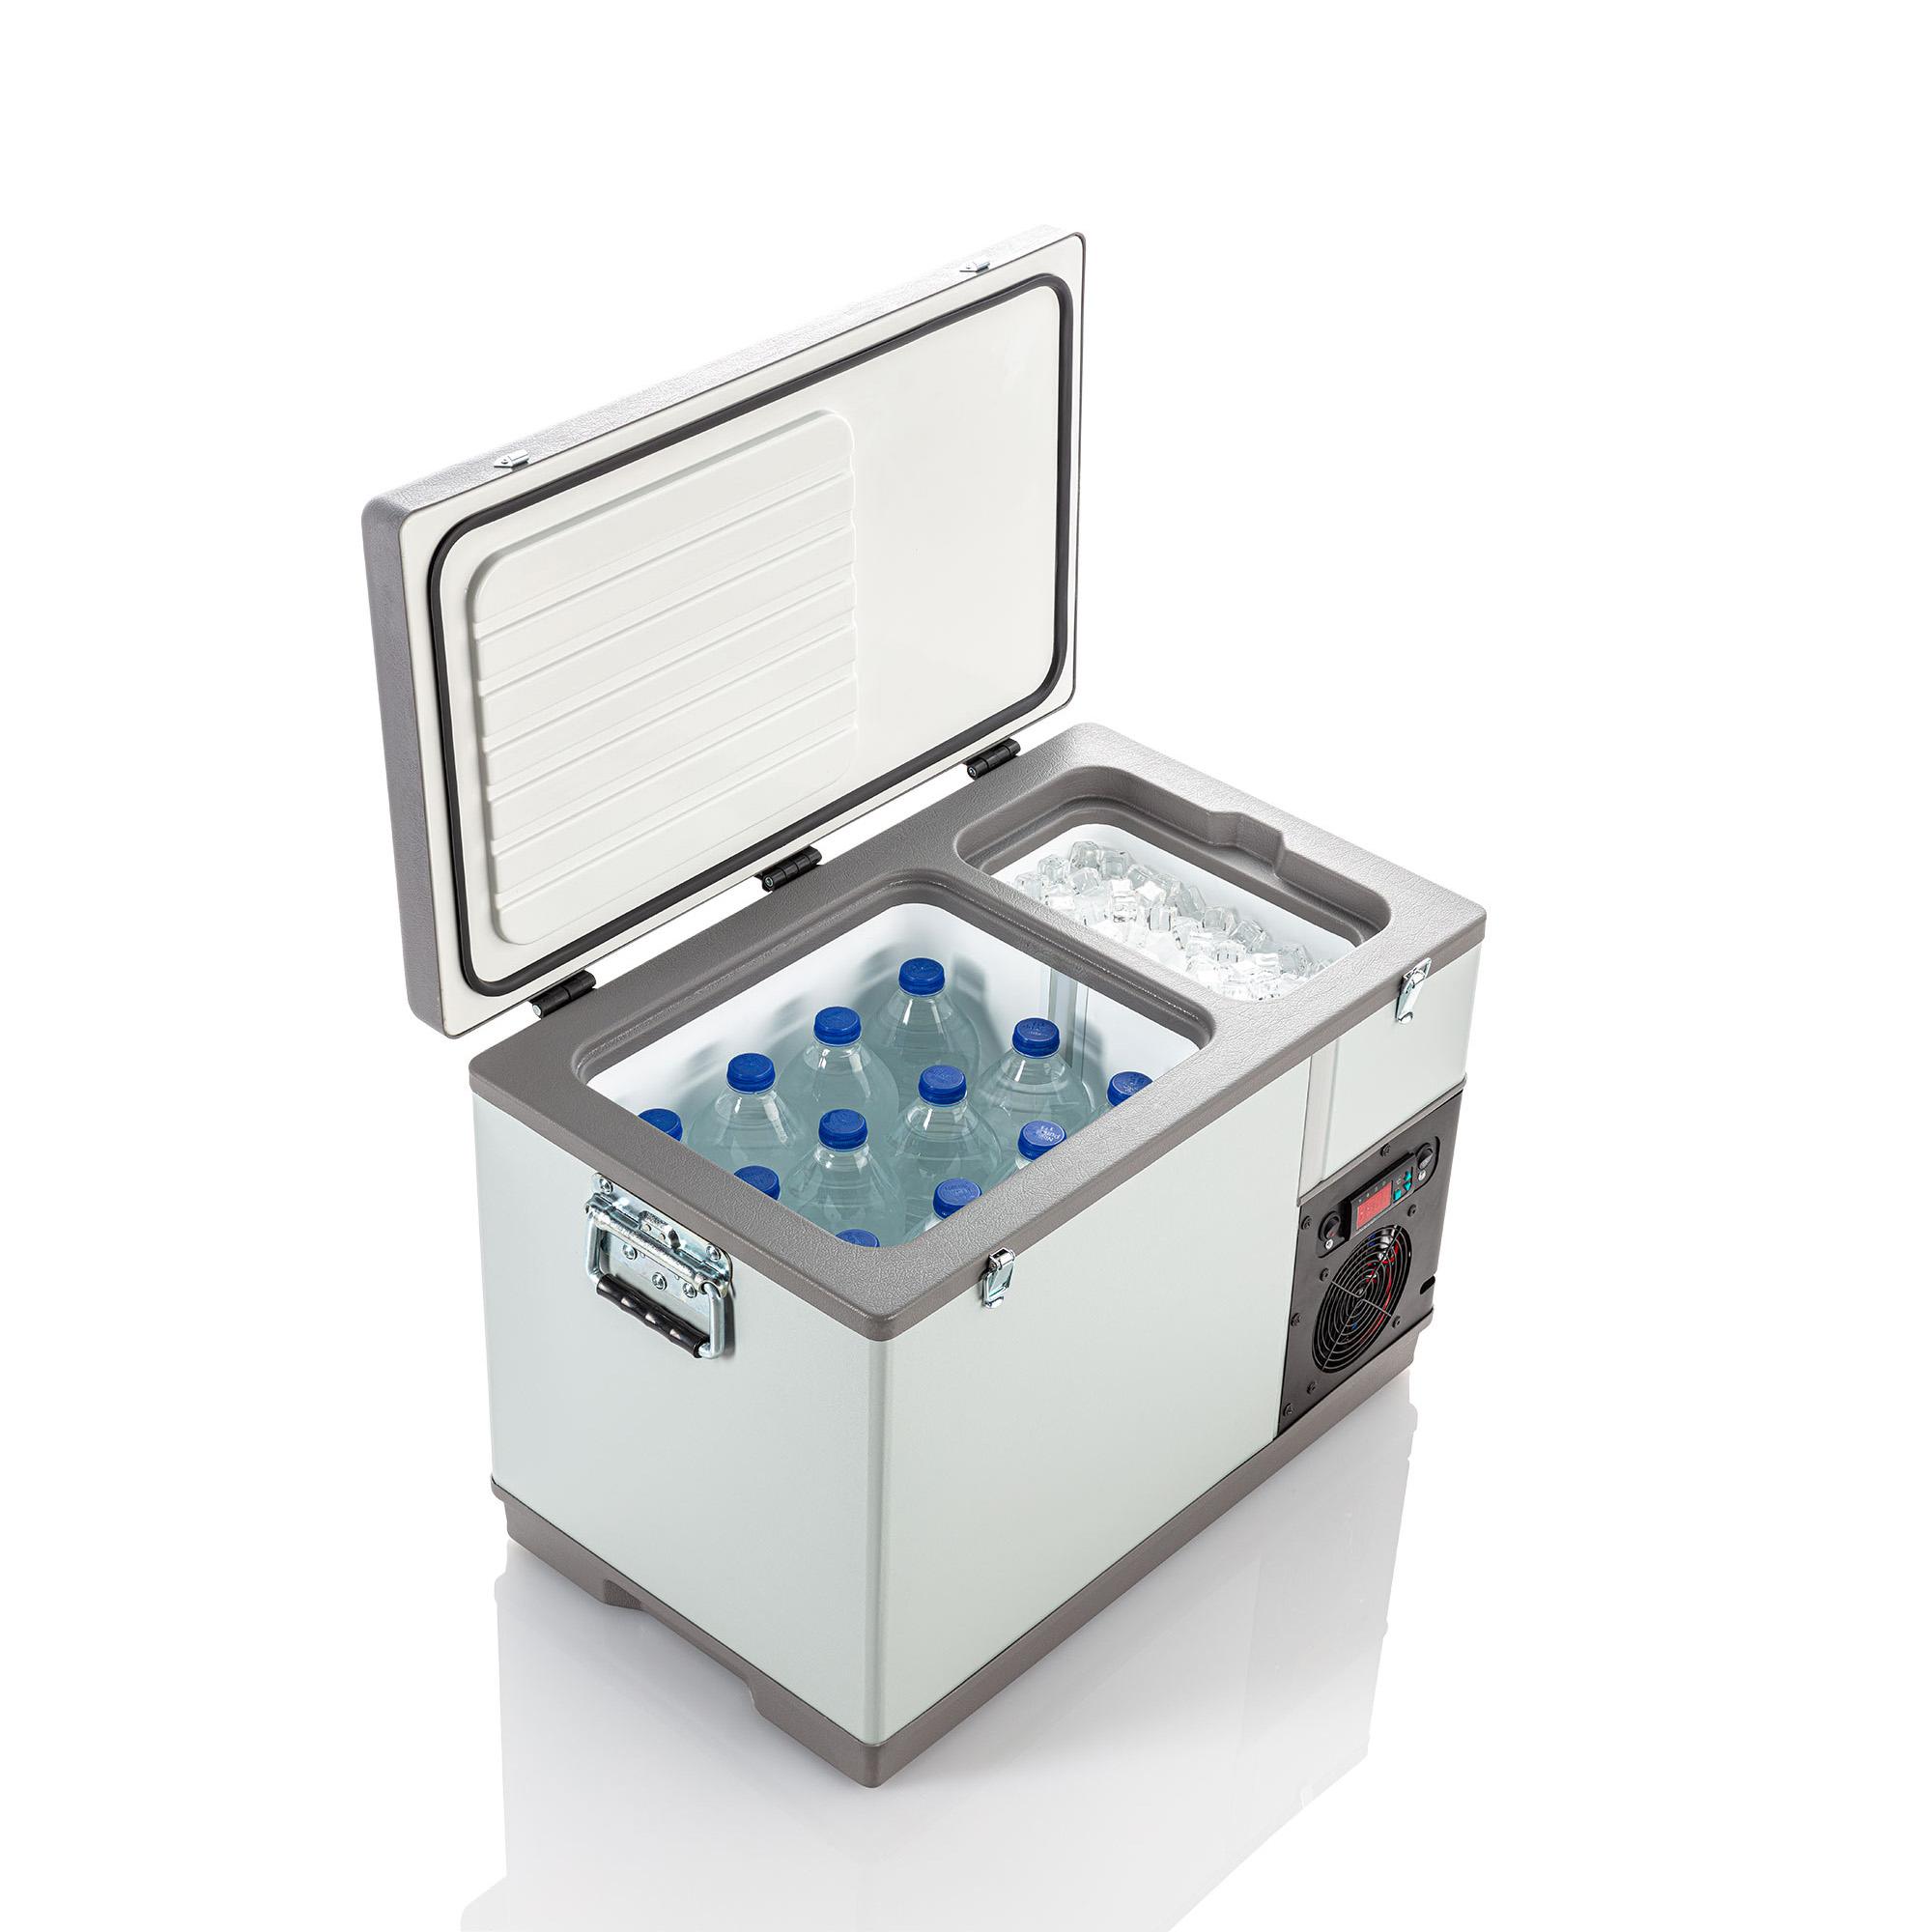 MPO 3846 COMBI 38 LT Soğutucu Araç Buzdolabı